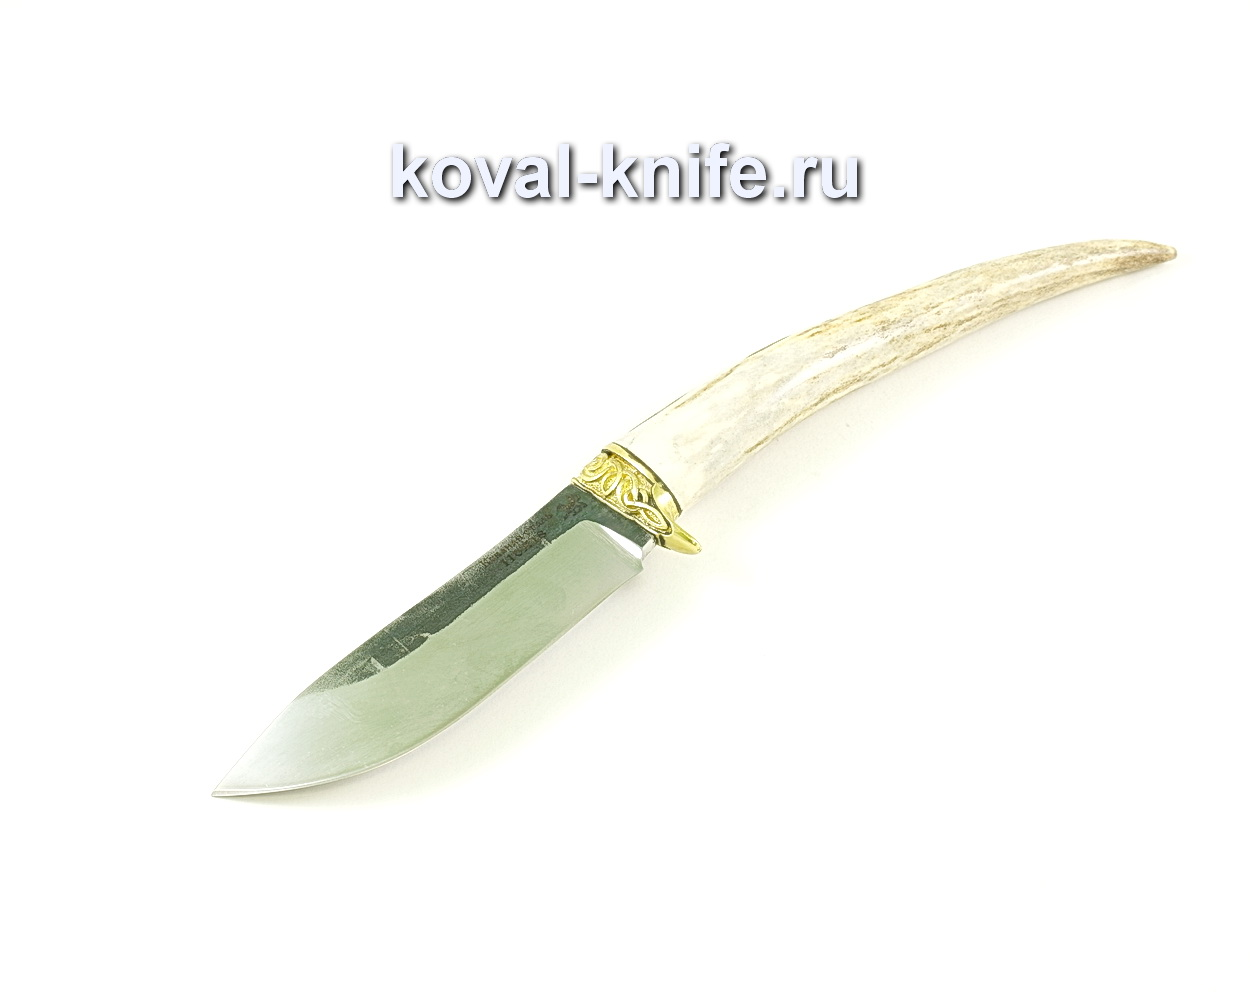 Нож Кабан (сталь 110х18), рукоять рог лося, литье A042